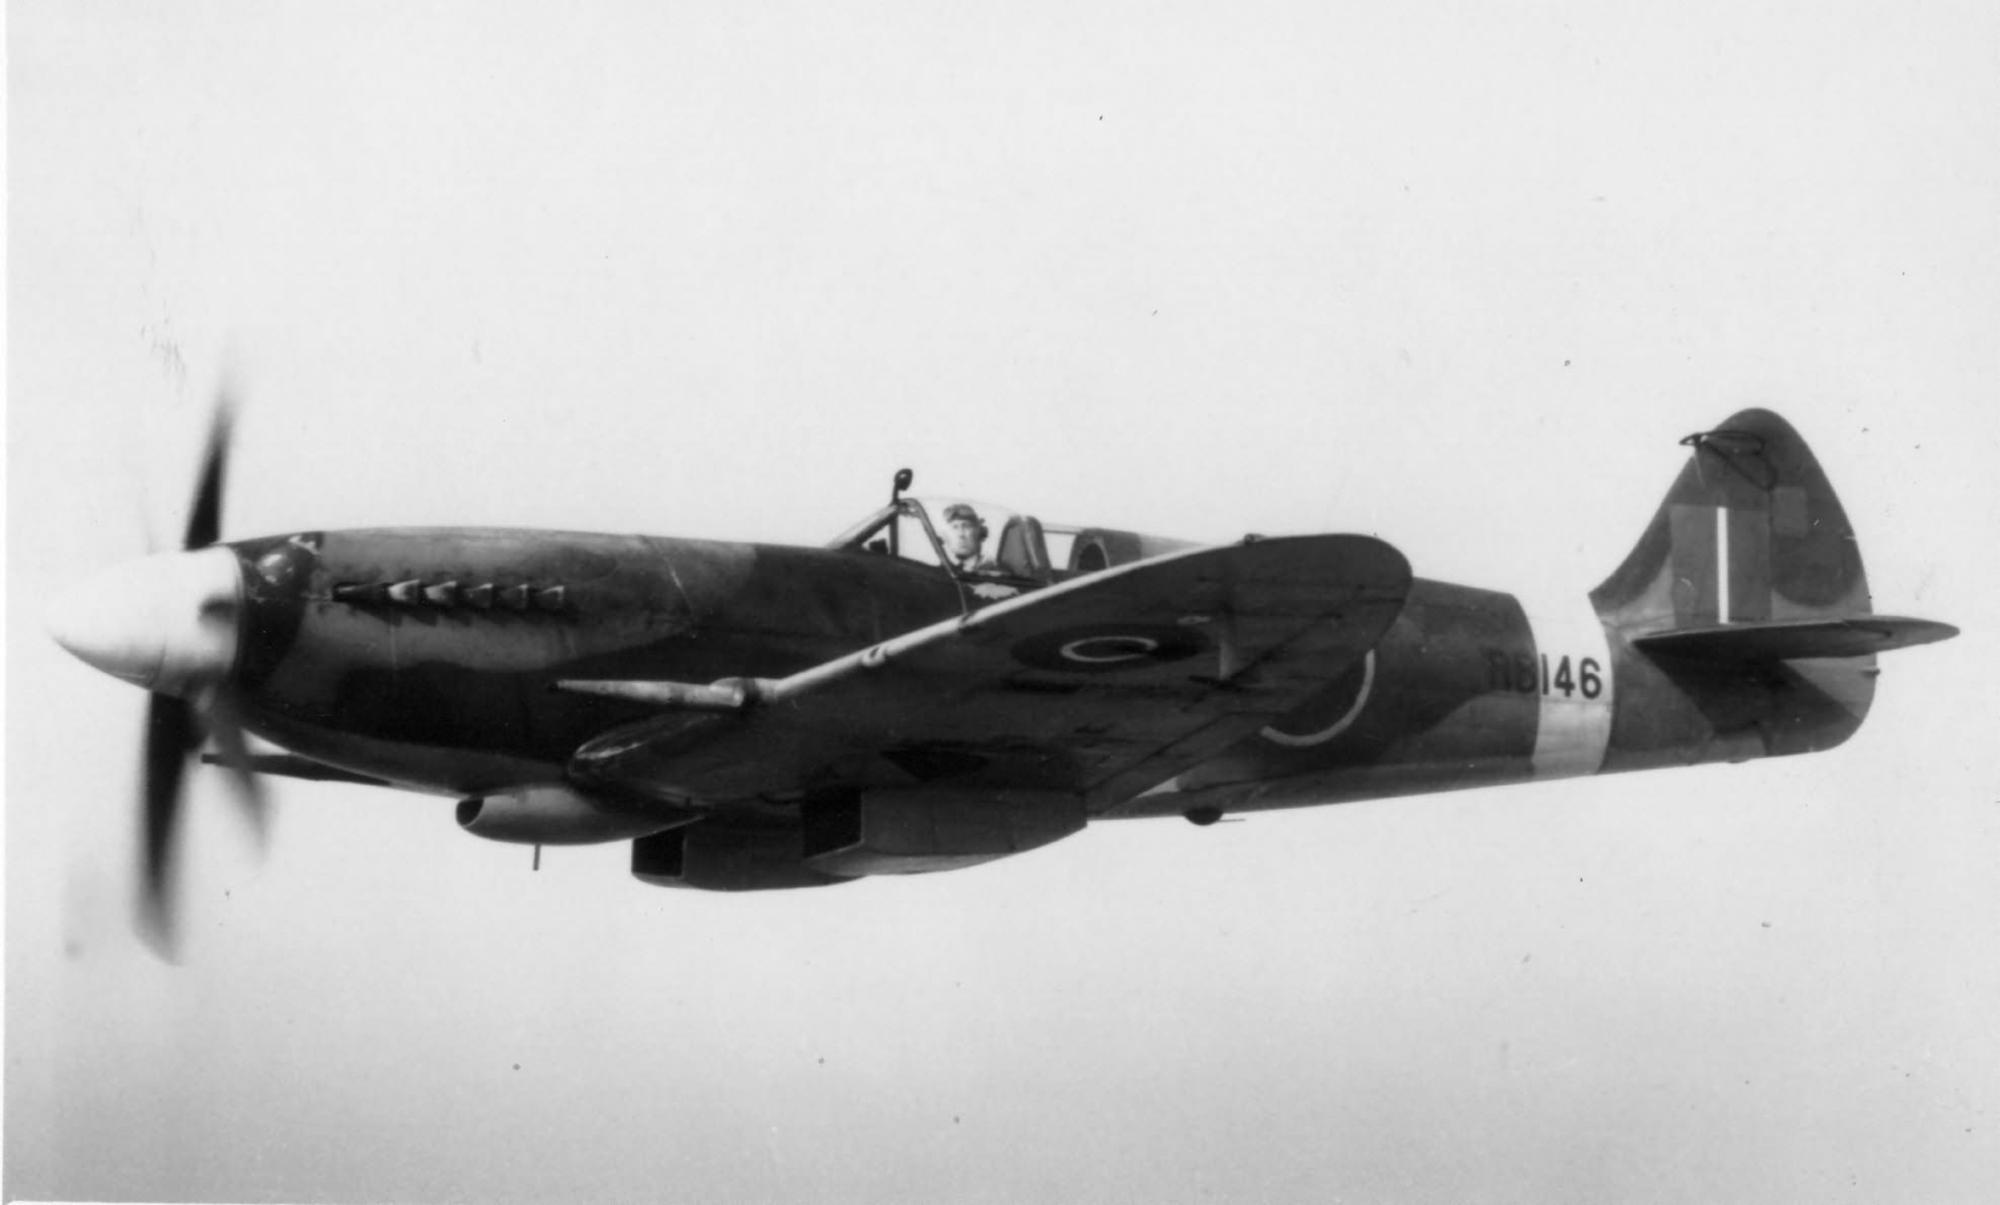 Spitfire XIV RAF RB146 in flight England web 01